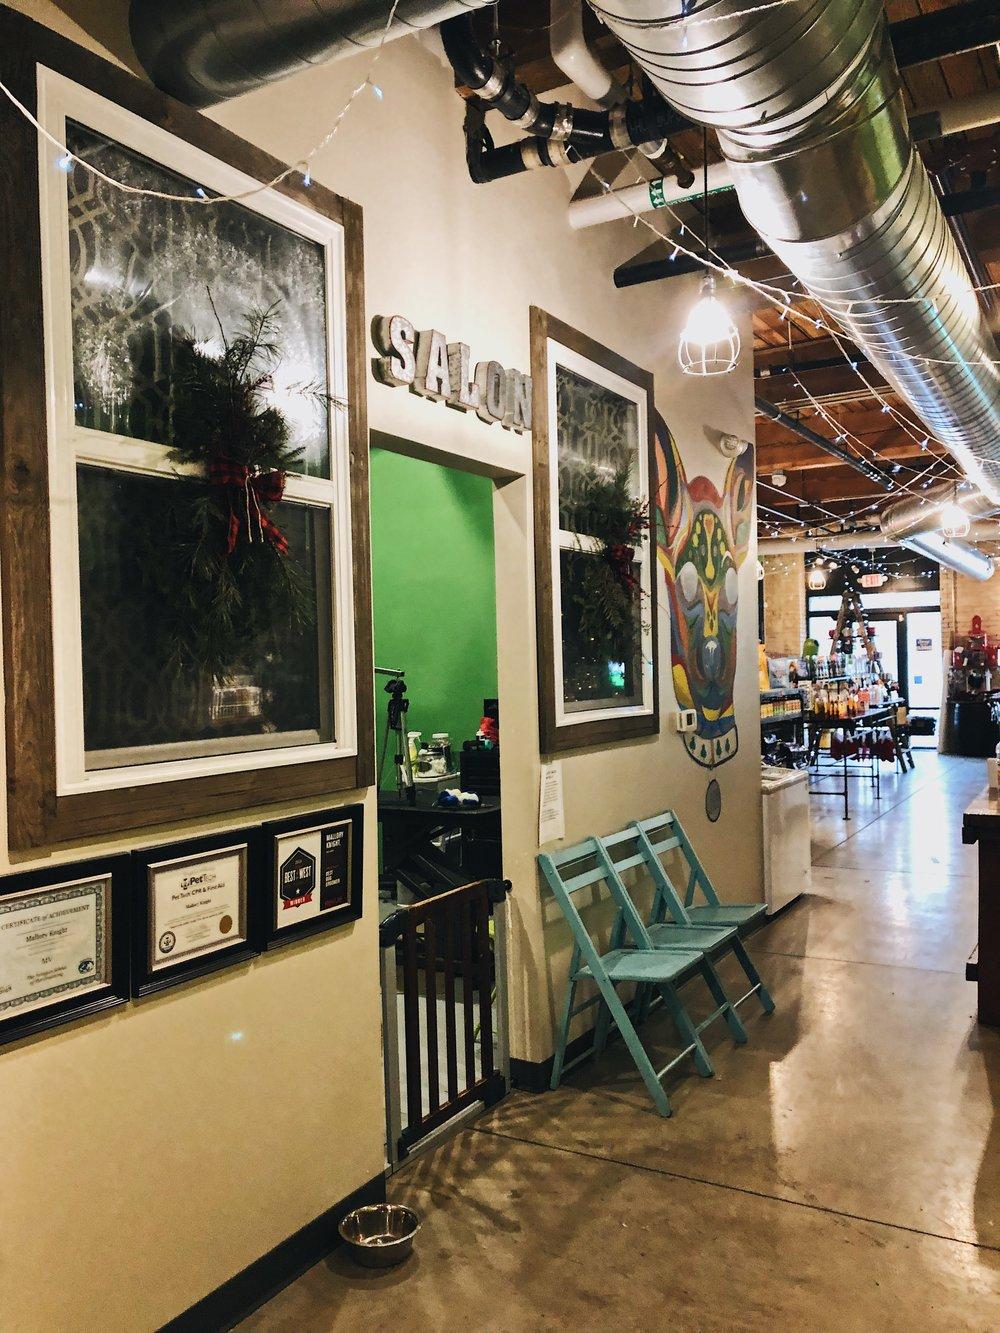 Salon station looking fresh.